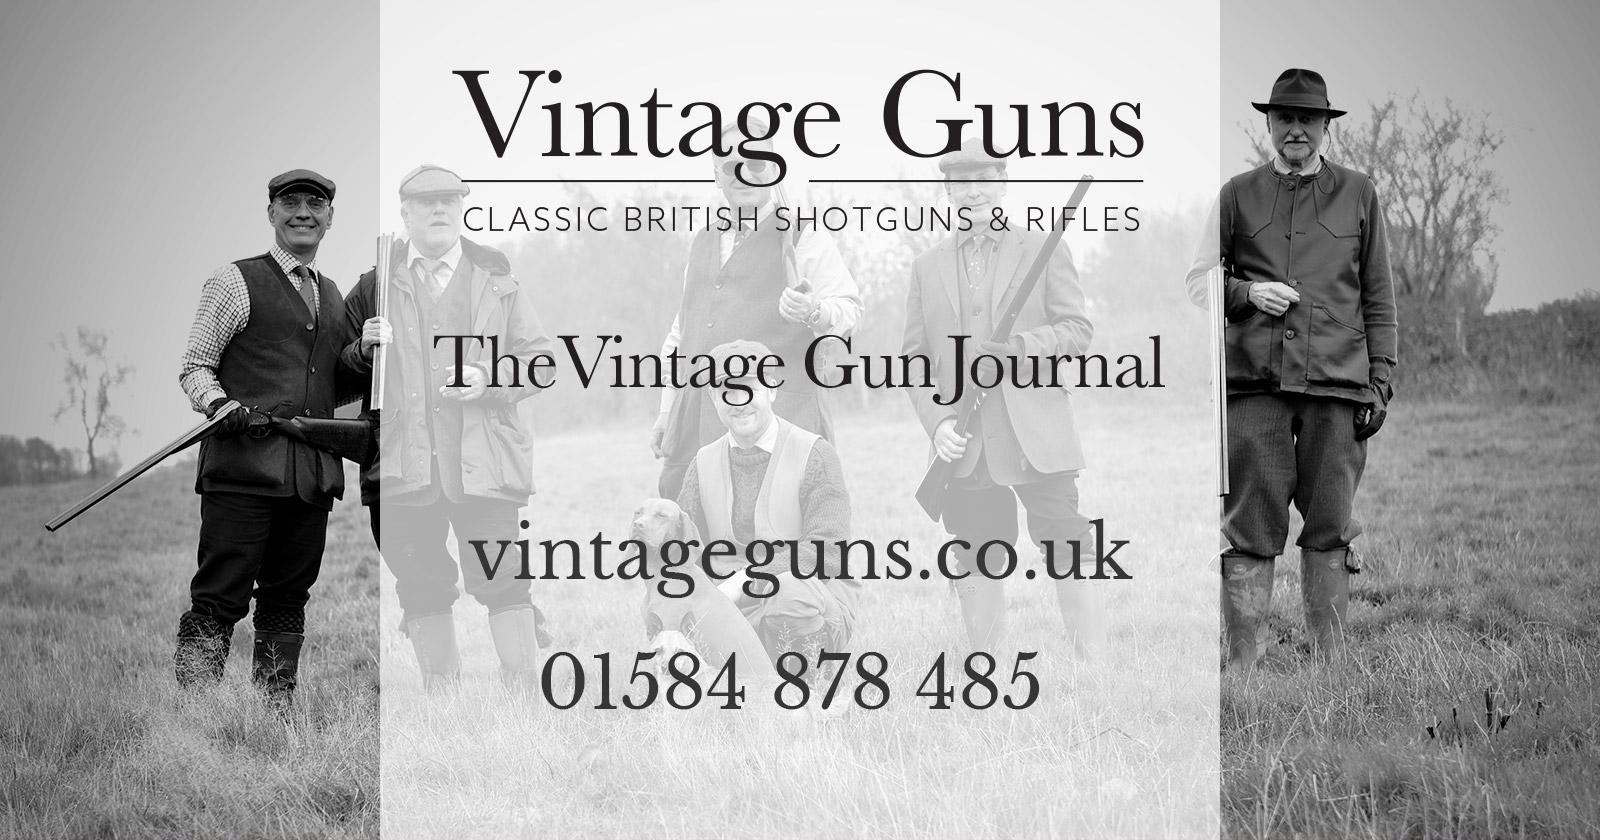 www.vintageguns.co.uk